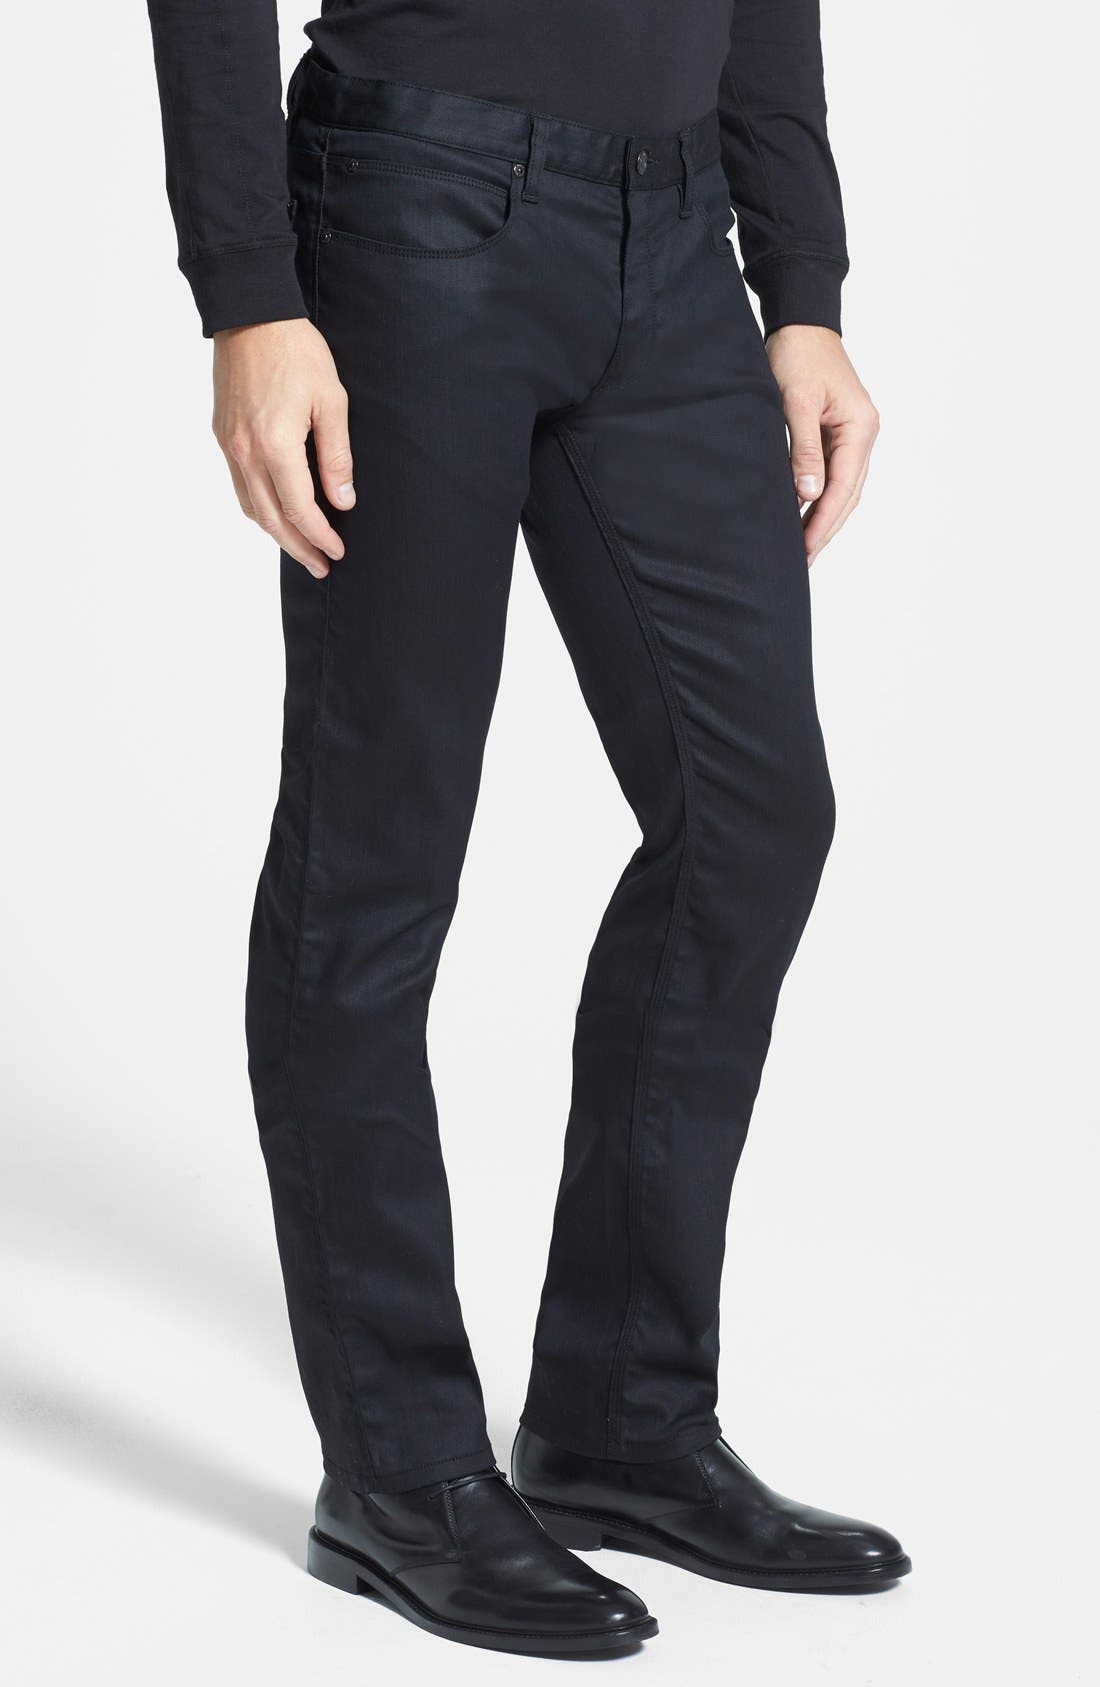 HUGO '708' Slim Fit Jeans,                             Alternate thumbnail 3, color,                             Black